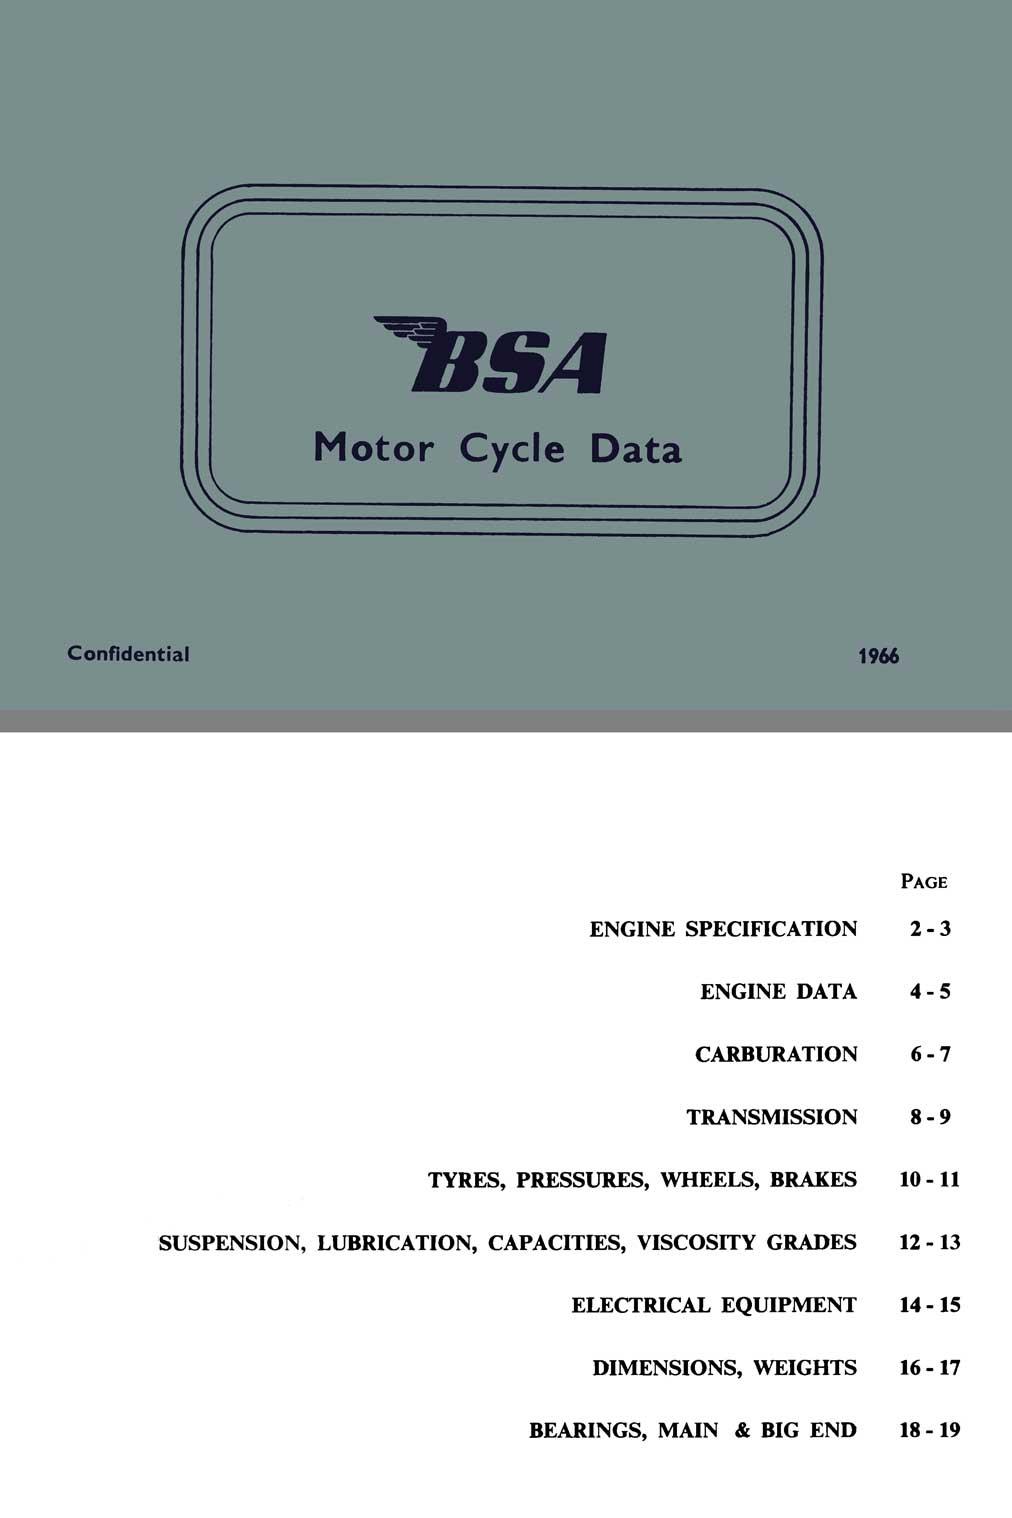 2007 honda cbr600rr owners manual